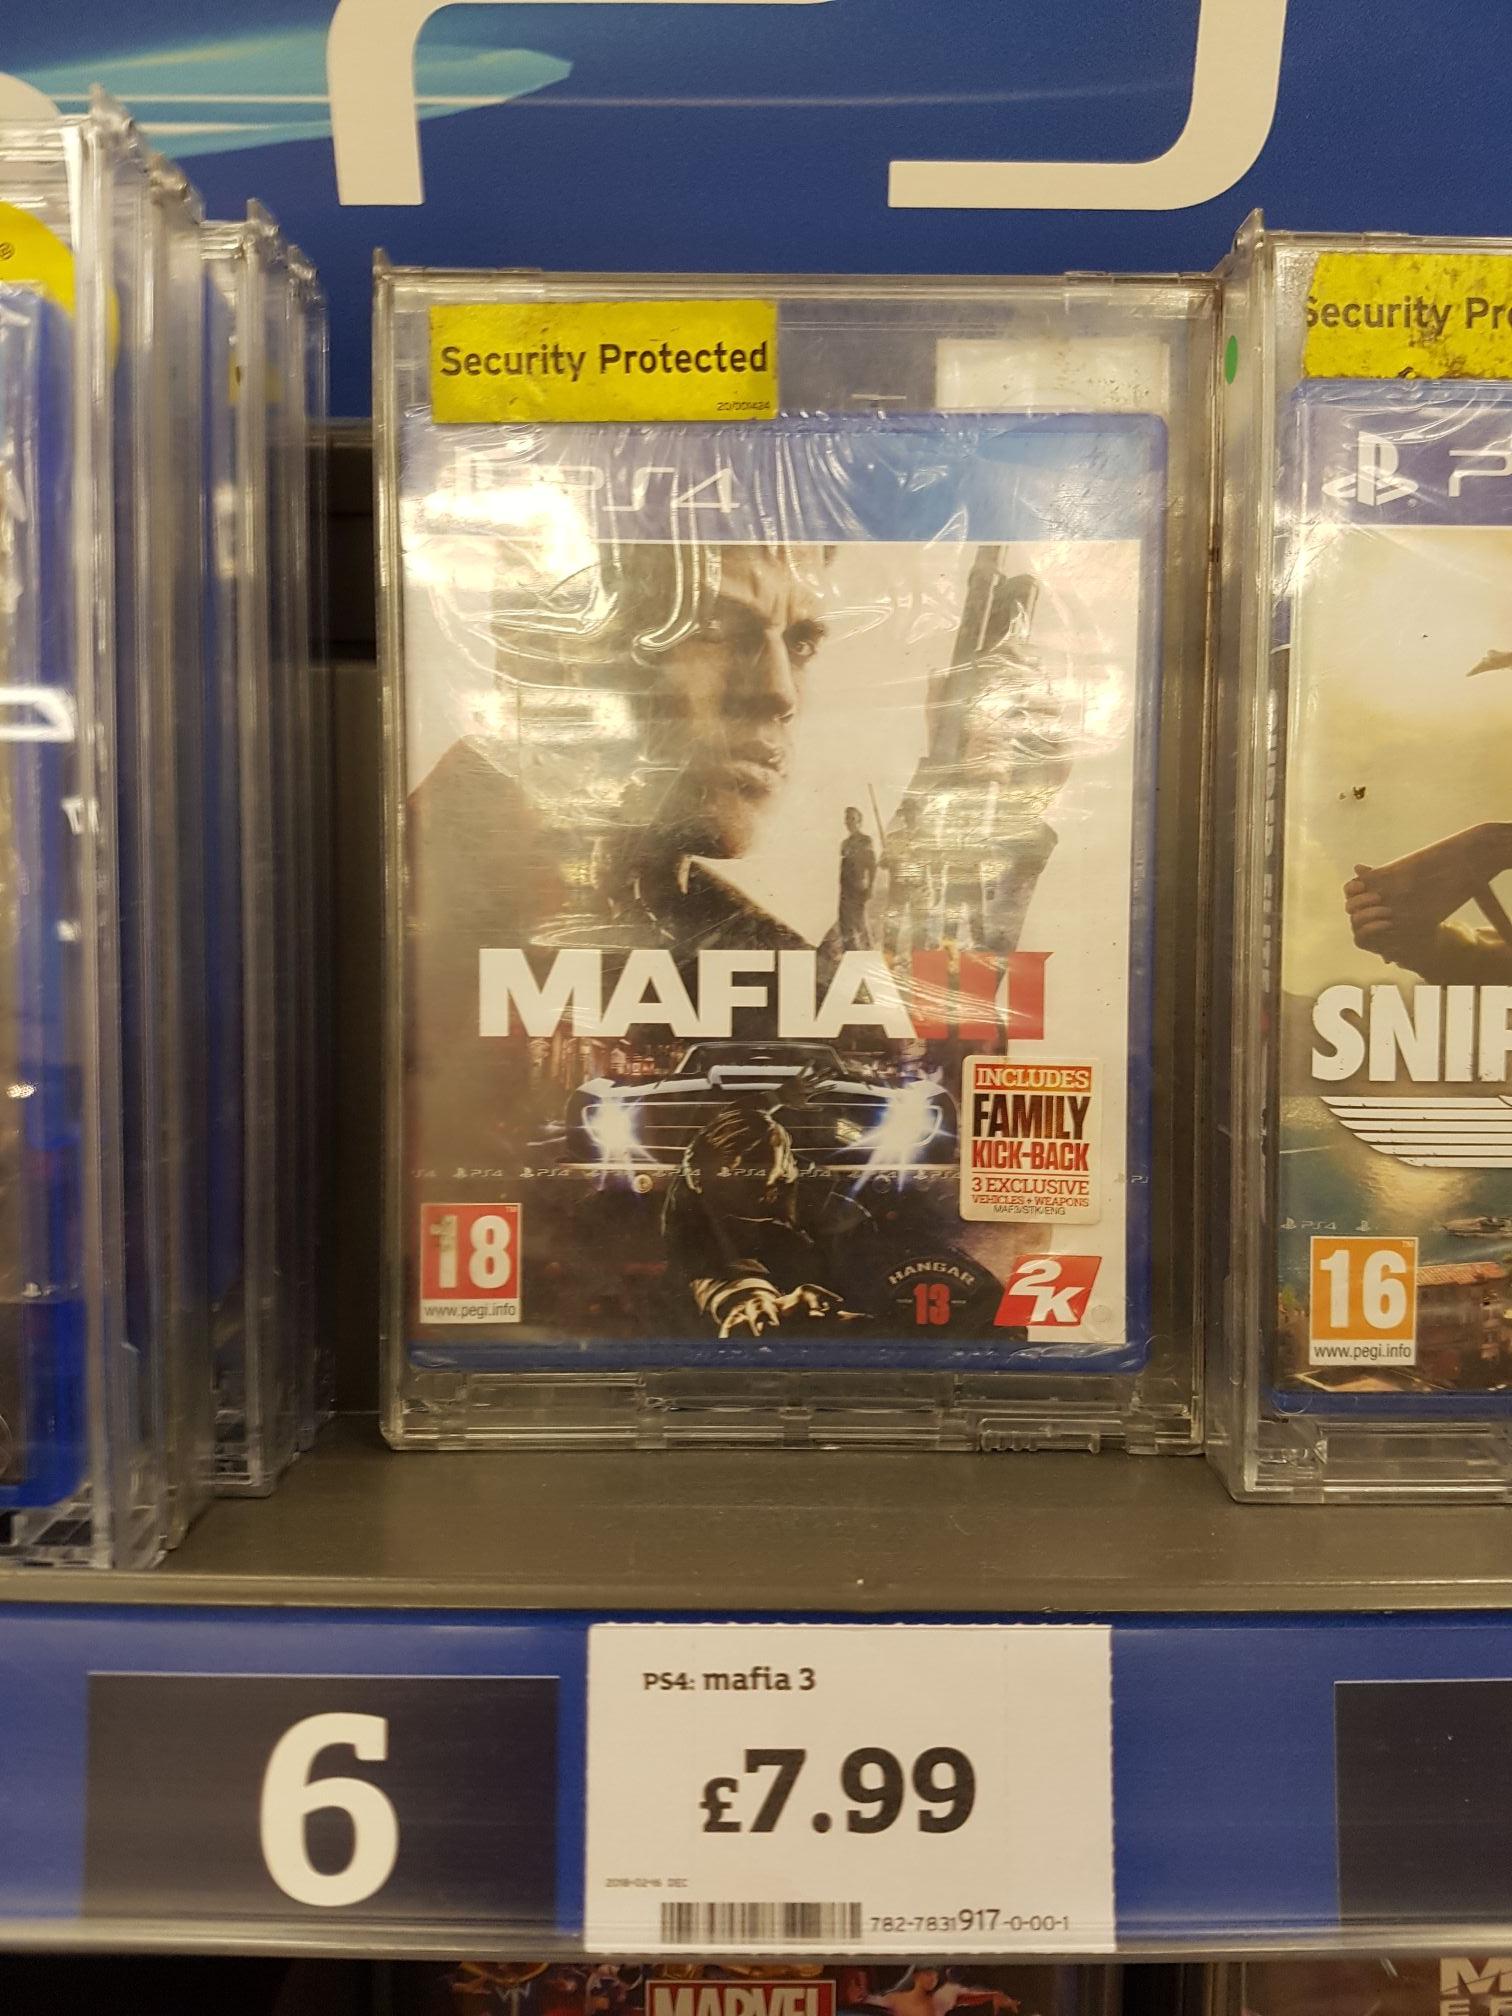 PlayStation 4 Mafia 3 - £7.99 @ Sainsbury's instore